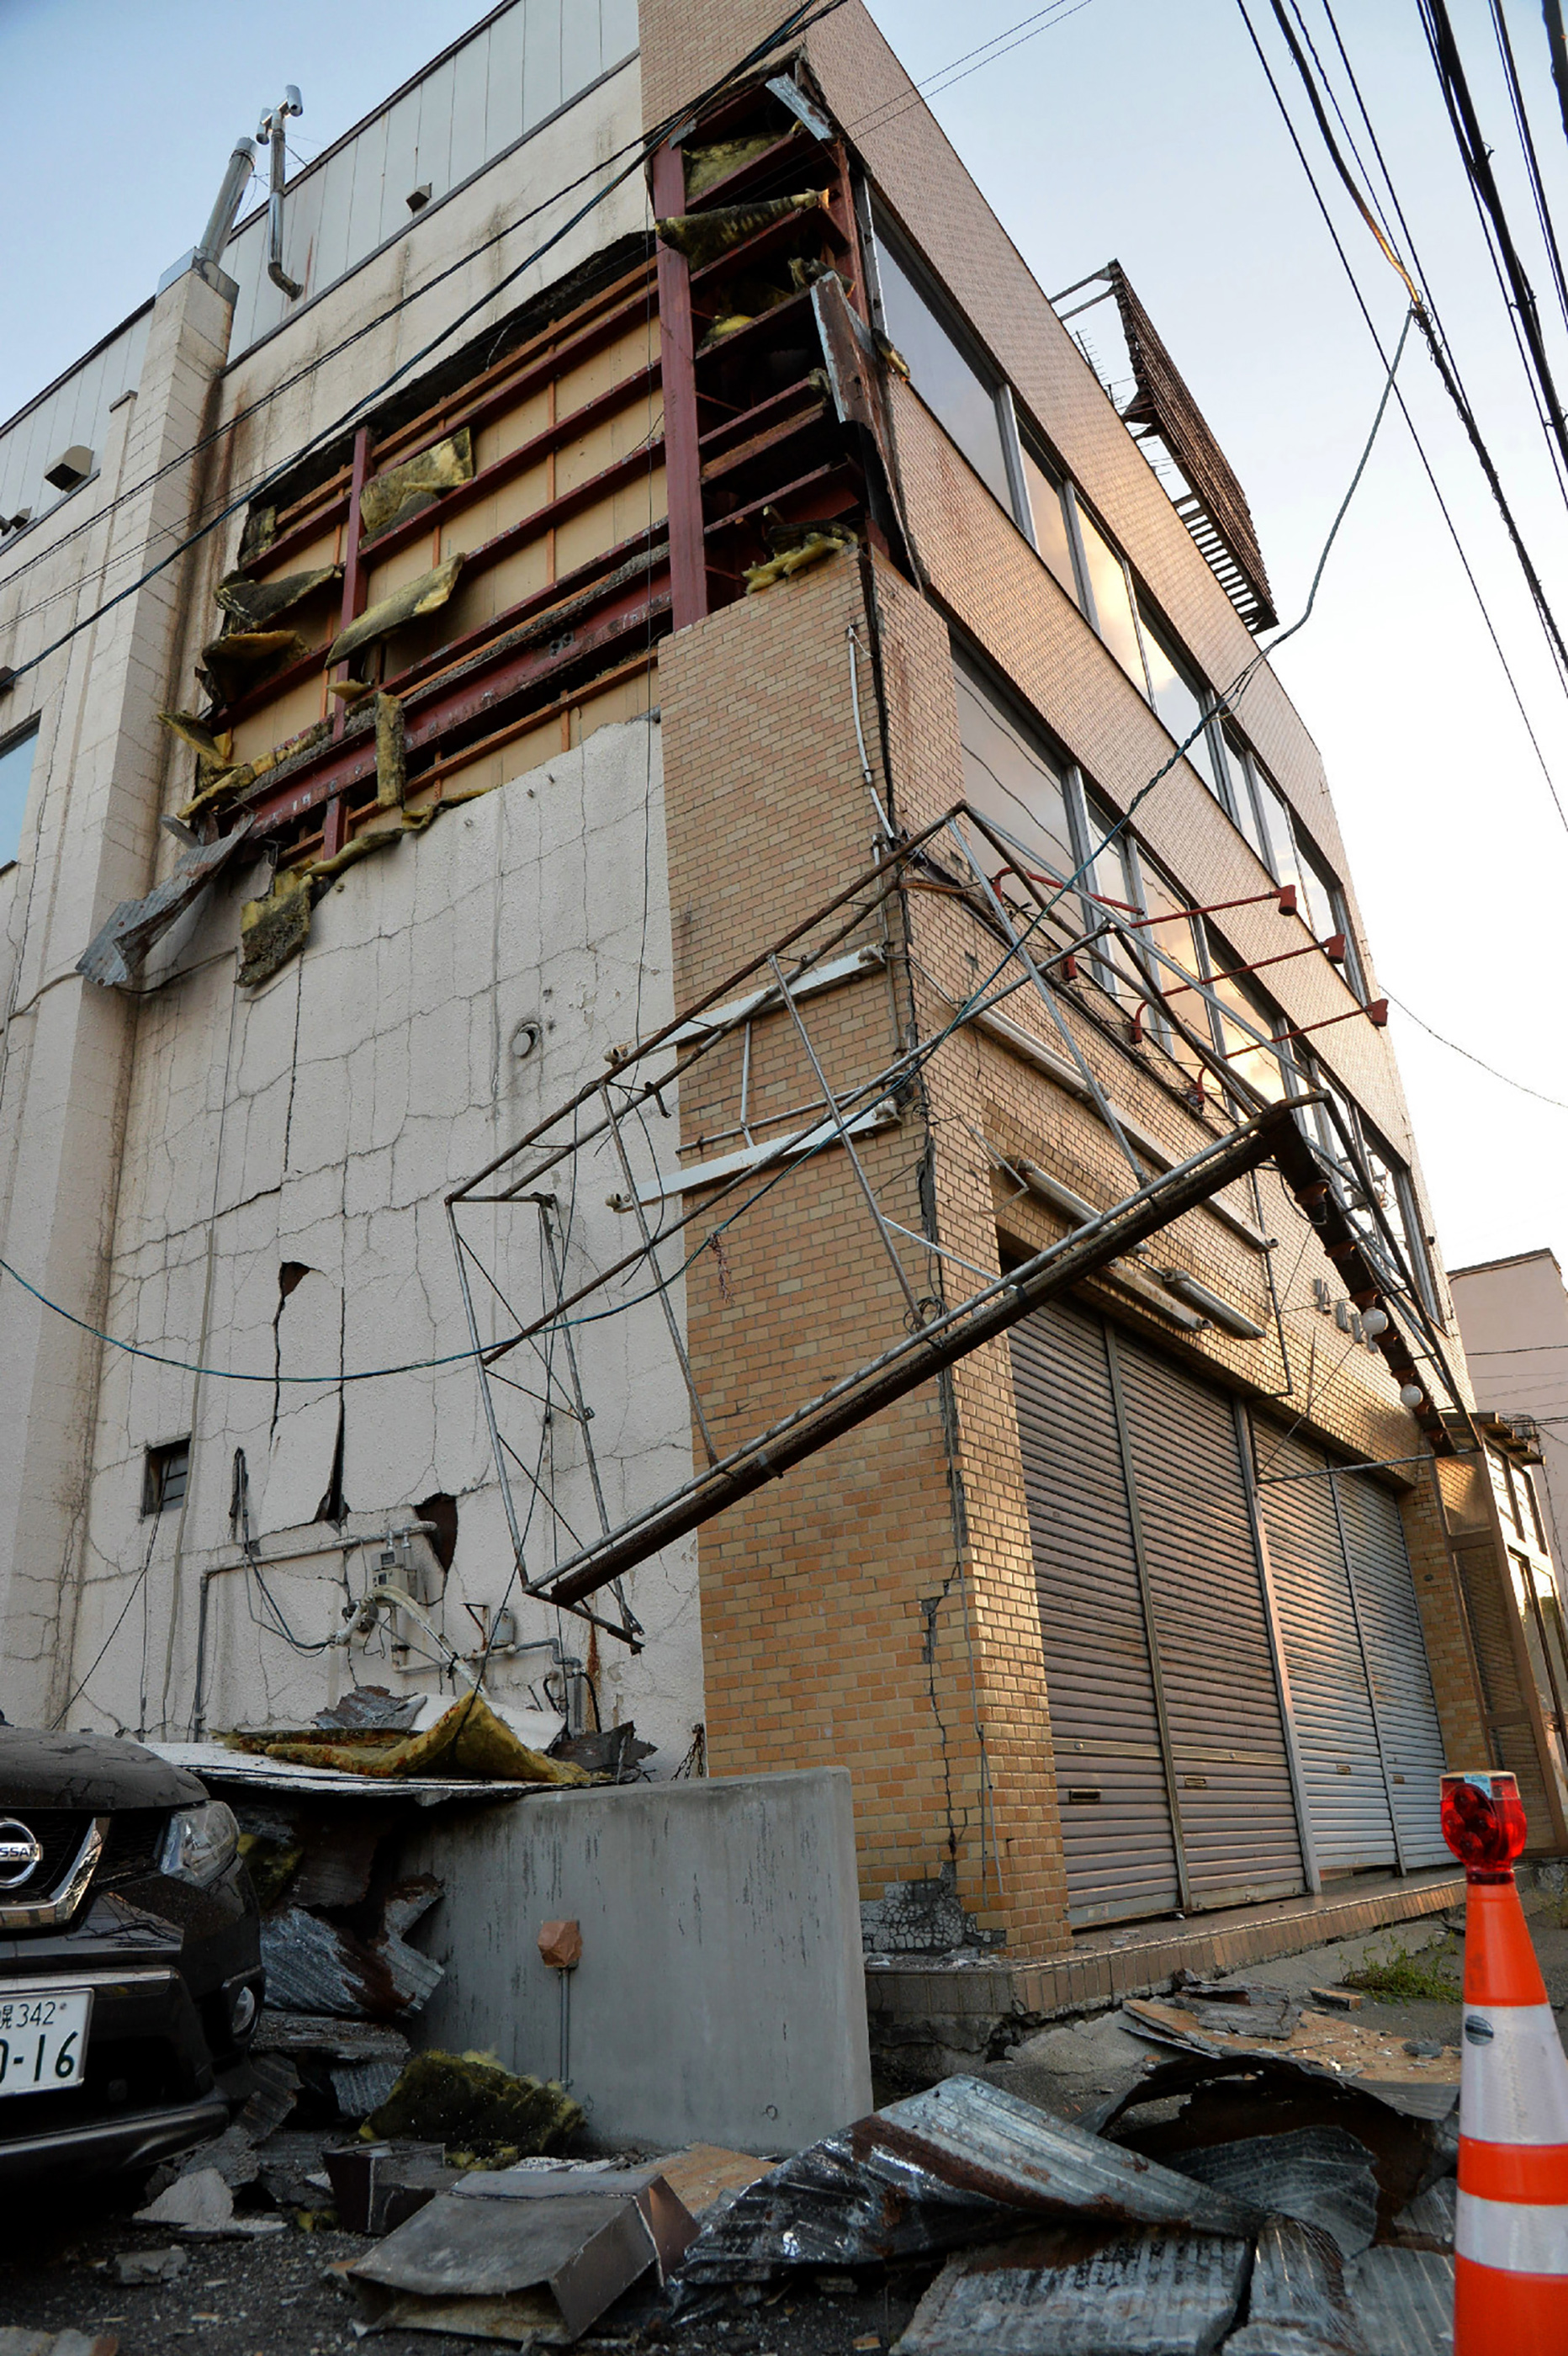 Un edificio dañano en Sapporo, Hokkaido (AFP PHOTO / JIJI PRESS / JIJI PRESS / Japan OUT)